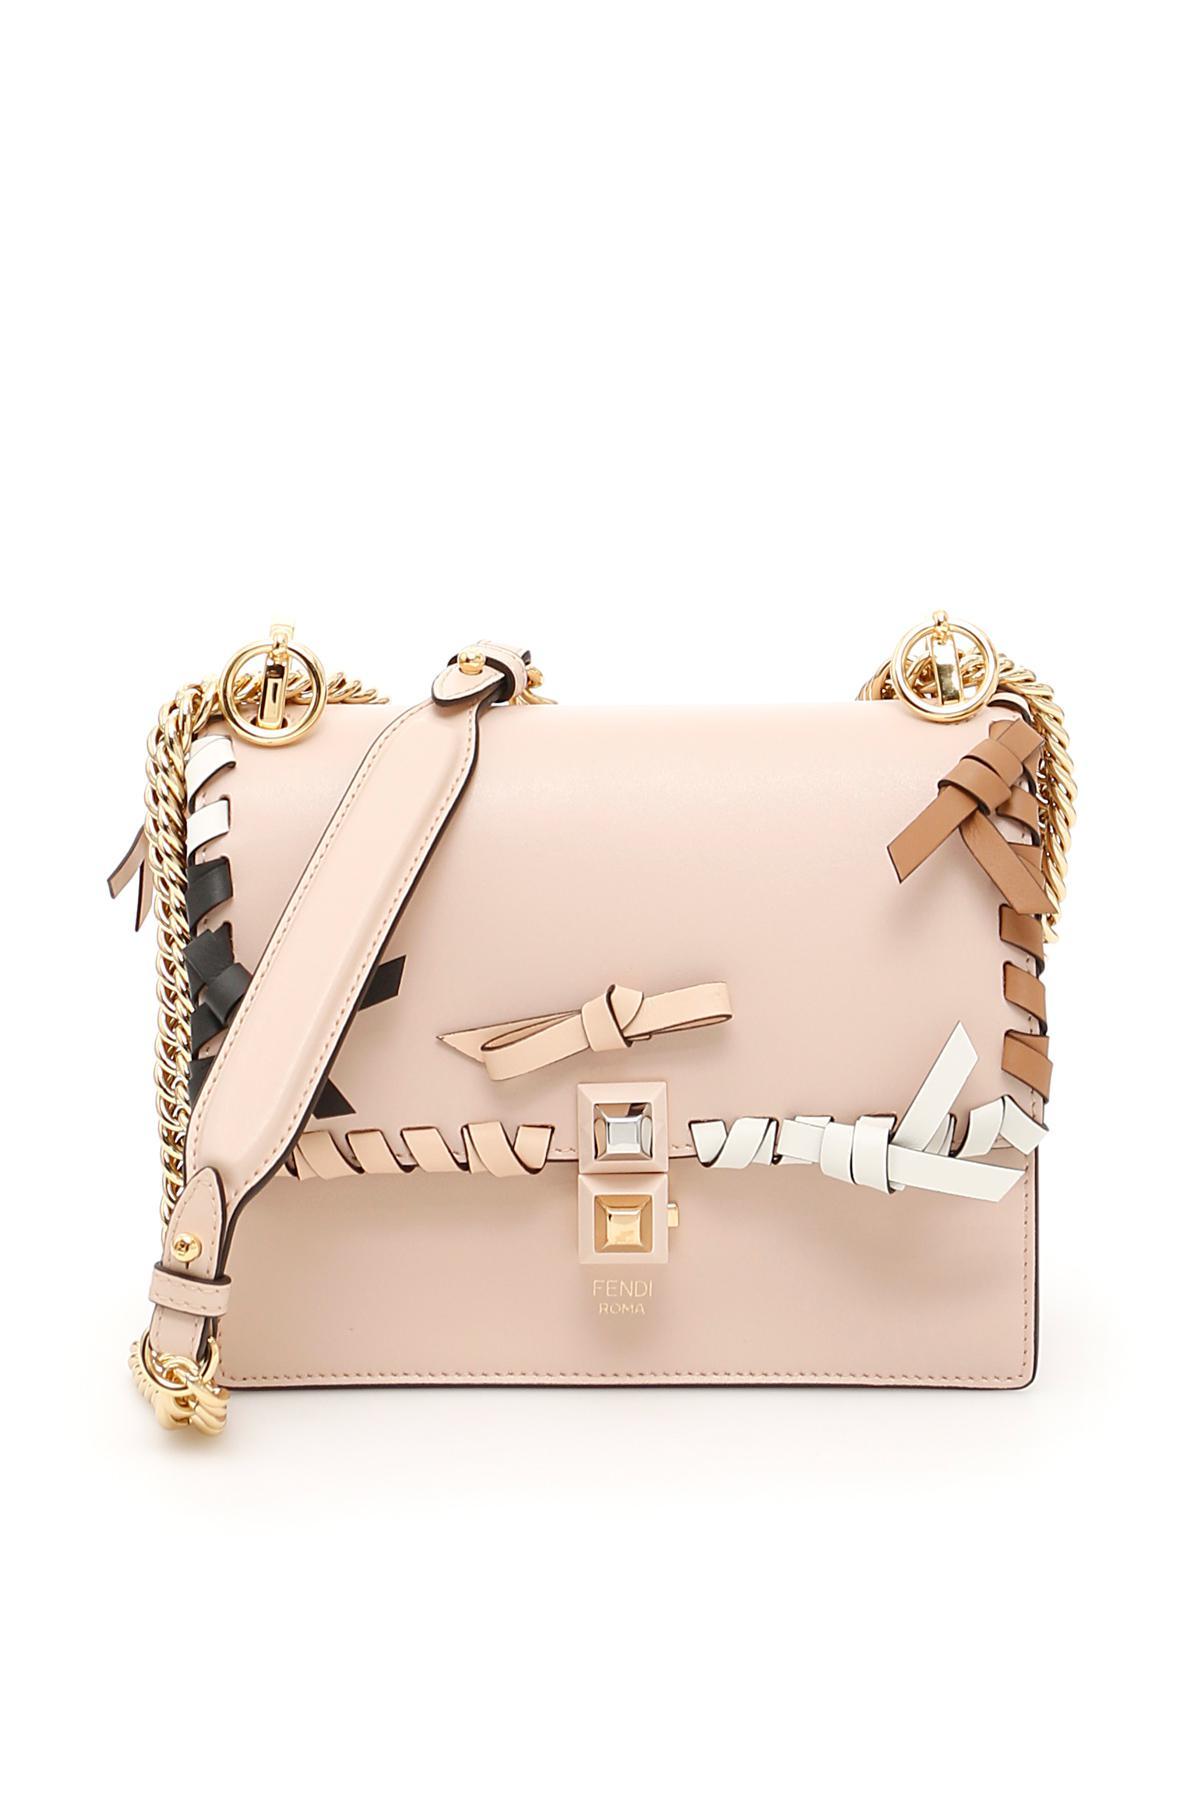 f69c87ecfe25 Fendi. Women s Small Kan I Bag